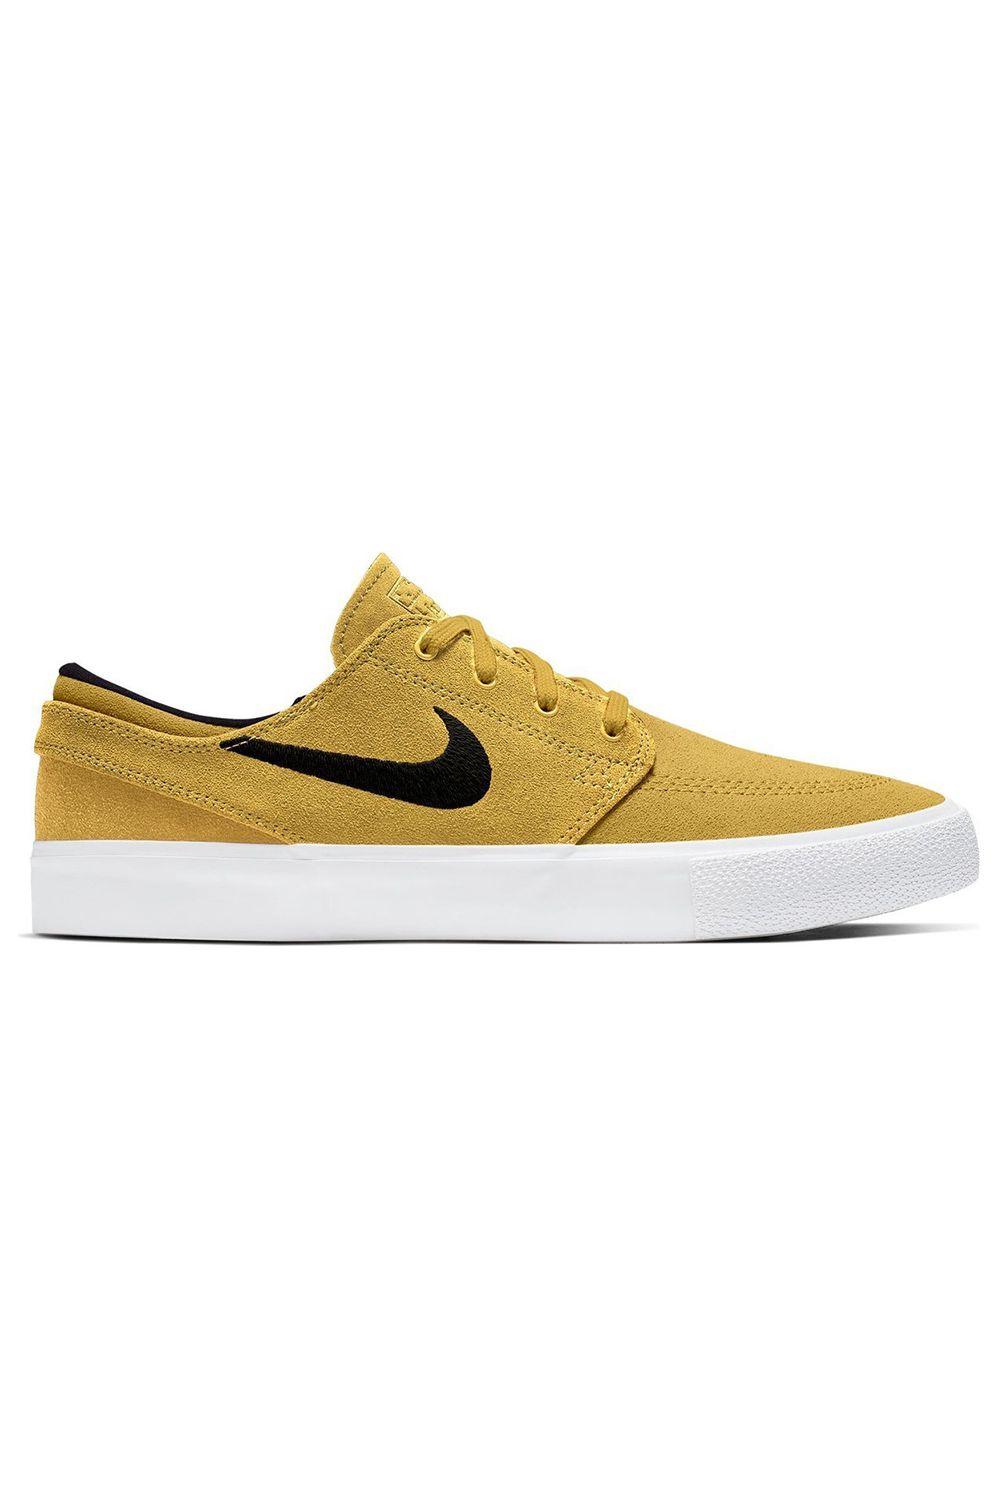 Tenis Nike Sb ZOOM STEFAN JANOSKI RM Solar Flare/Black-Solar Flare